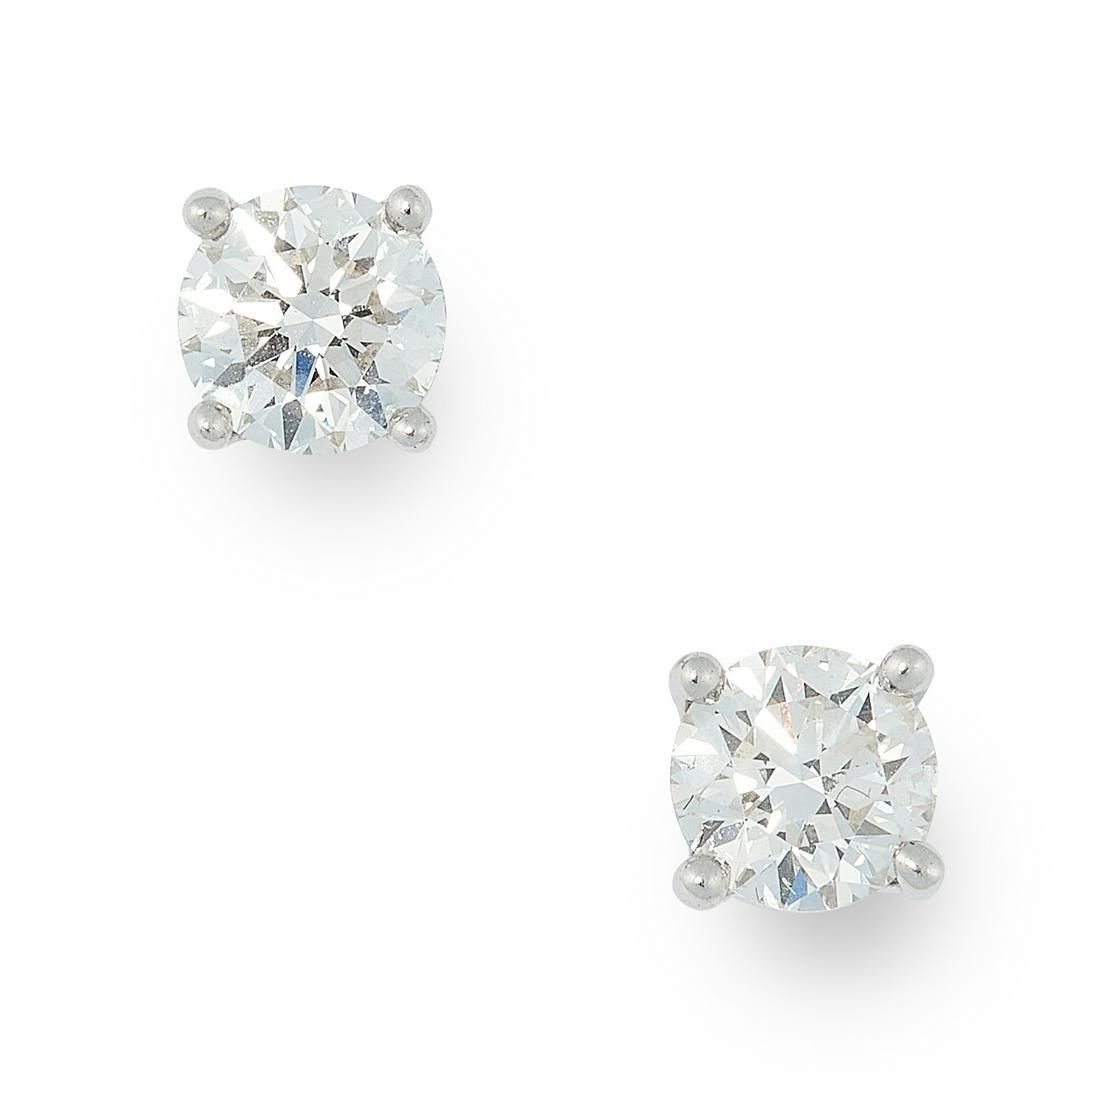 A PAIR OF 1.34 CARAT DIAMOND STUD EARRINGS, TIFFANY &